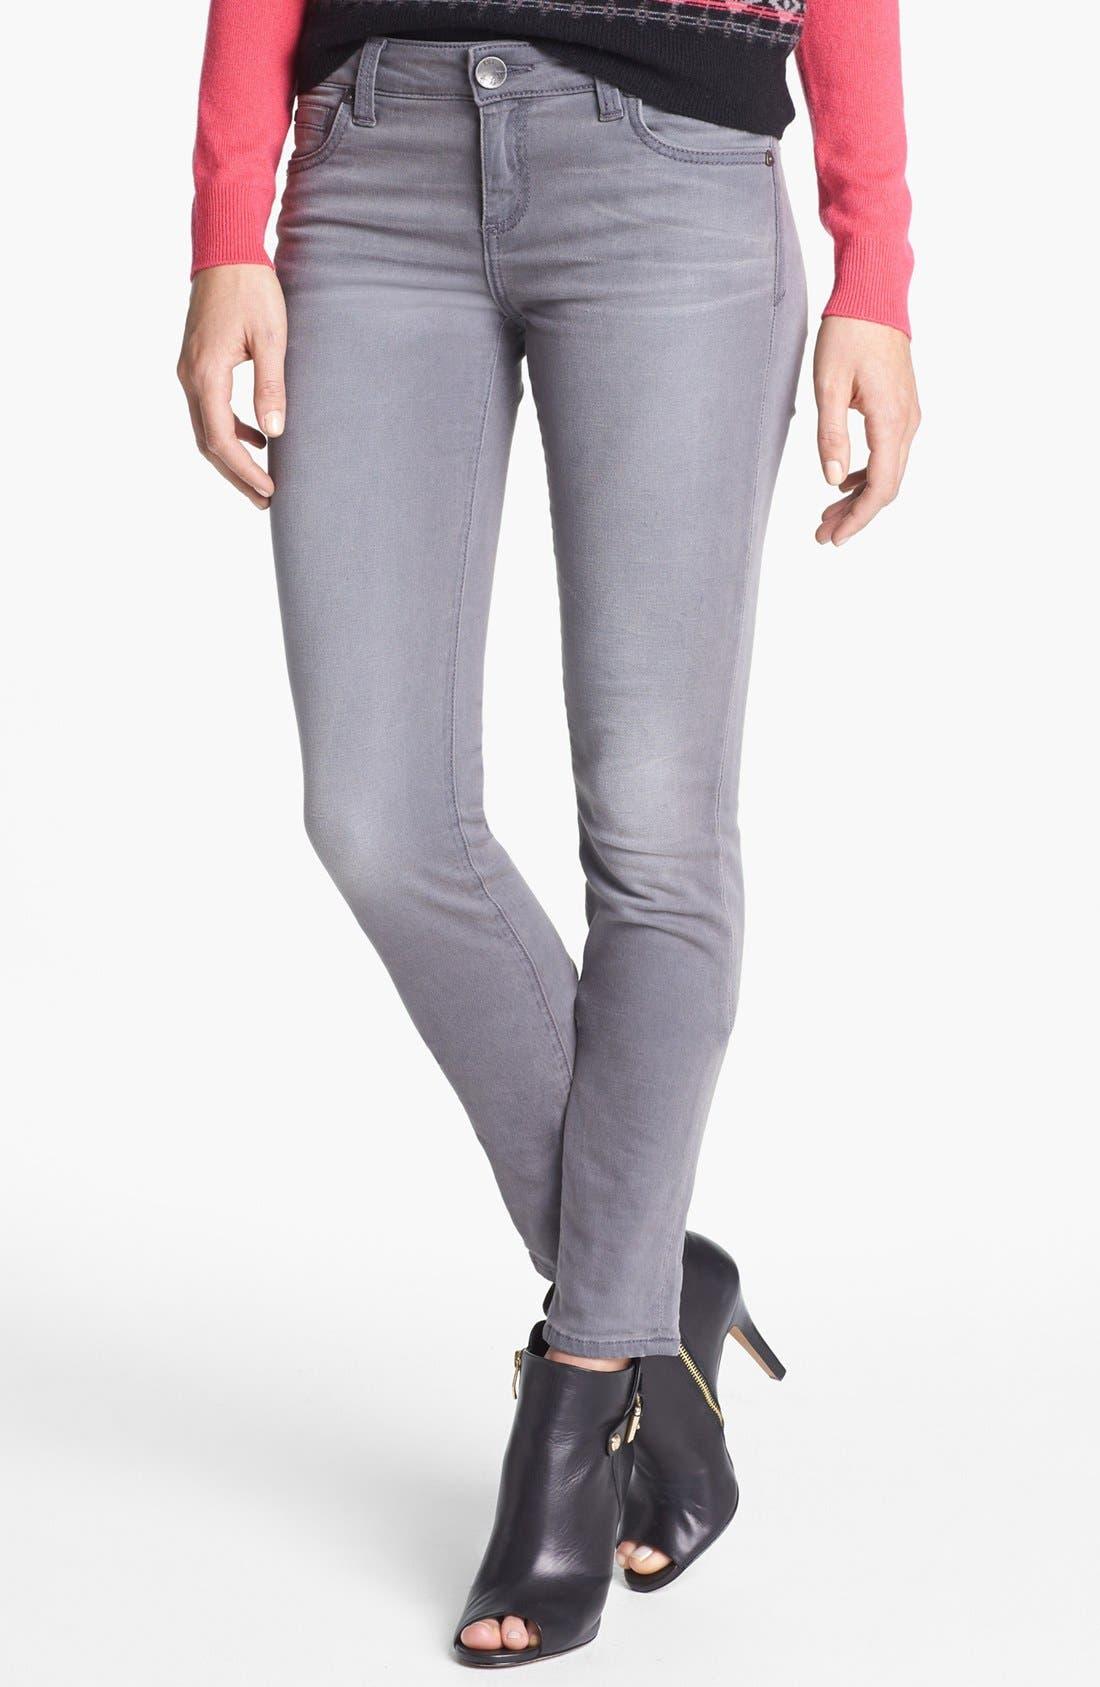 Main Image - KUT from the Kloth 'Mia' Skinny Jeans (Grey)